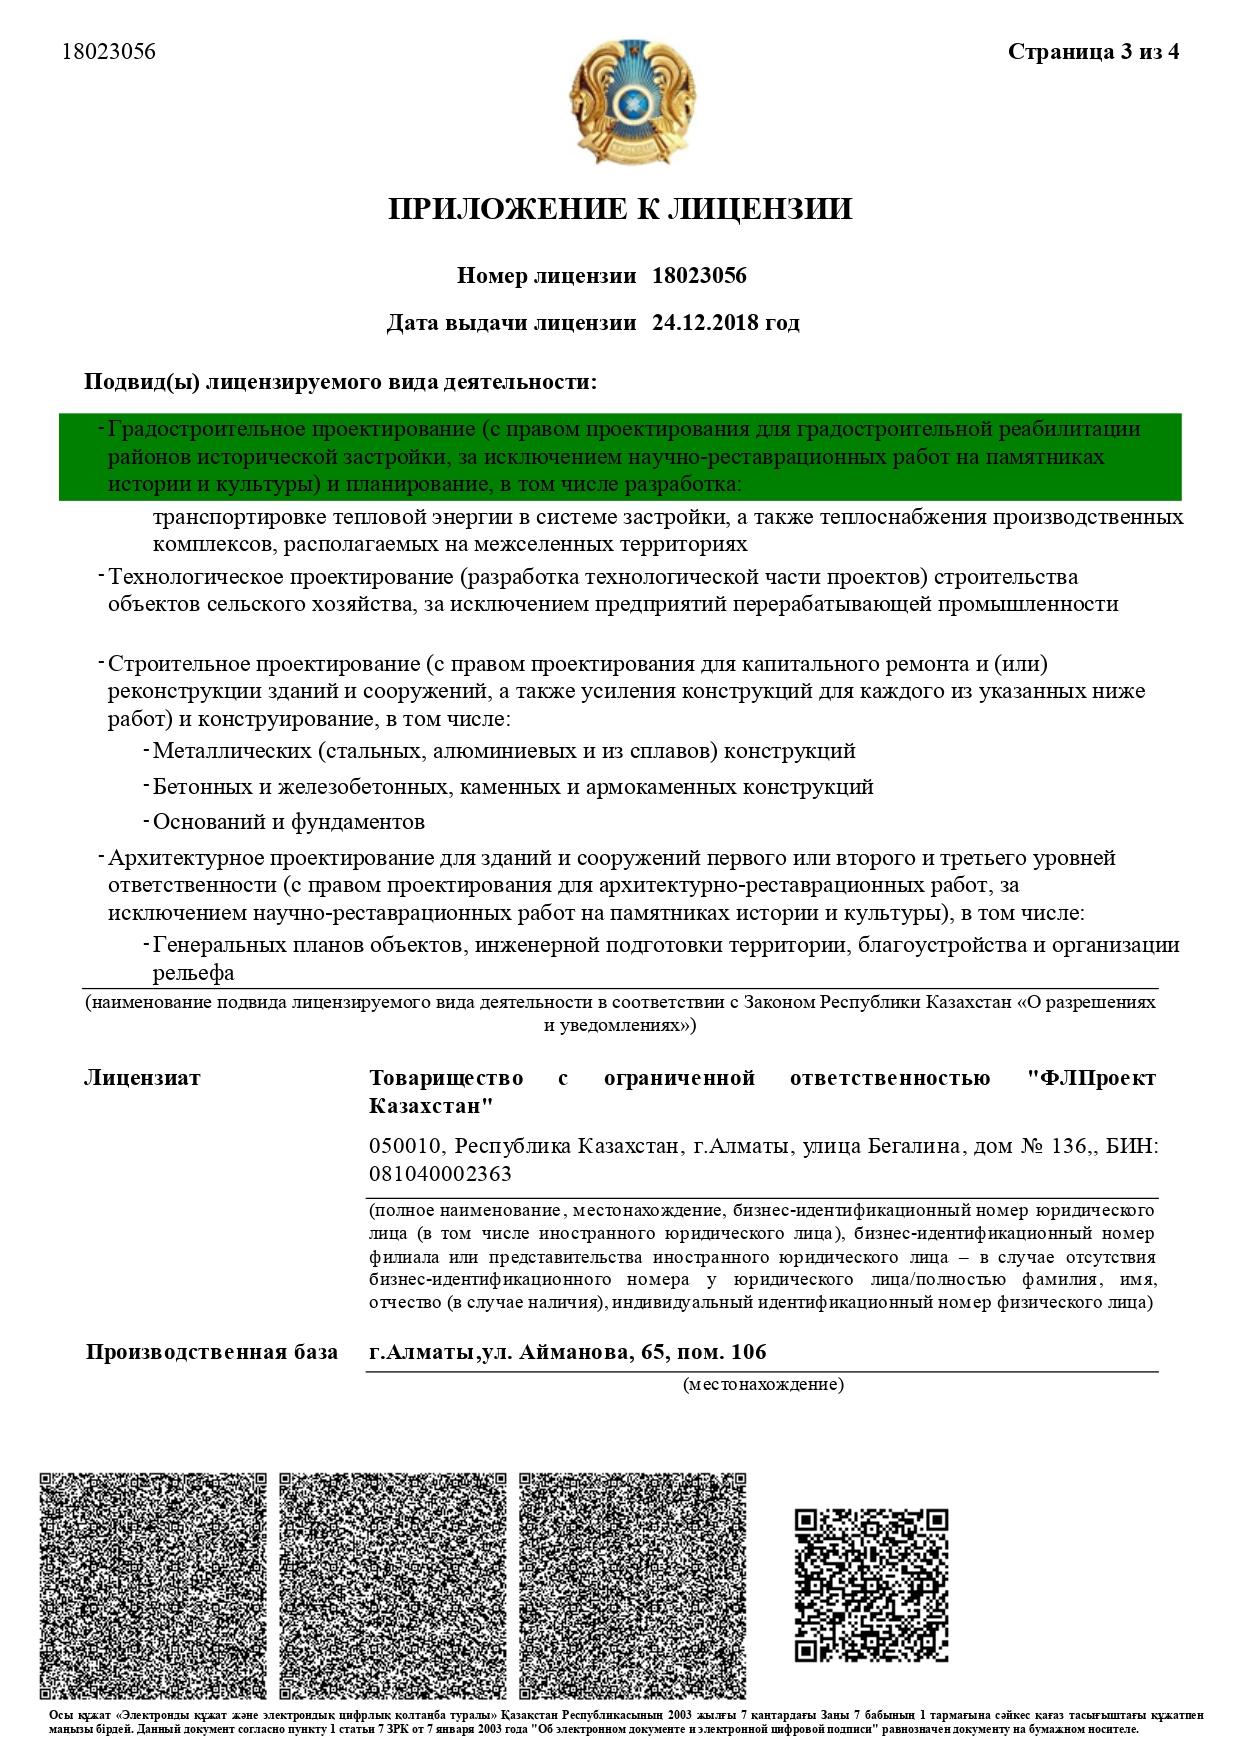 1-kategoriya-page-00045DCB1EDD-7DDA-E00C-1400-8357377460F5.jpg